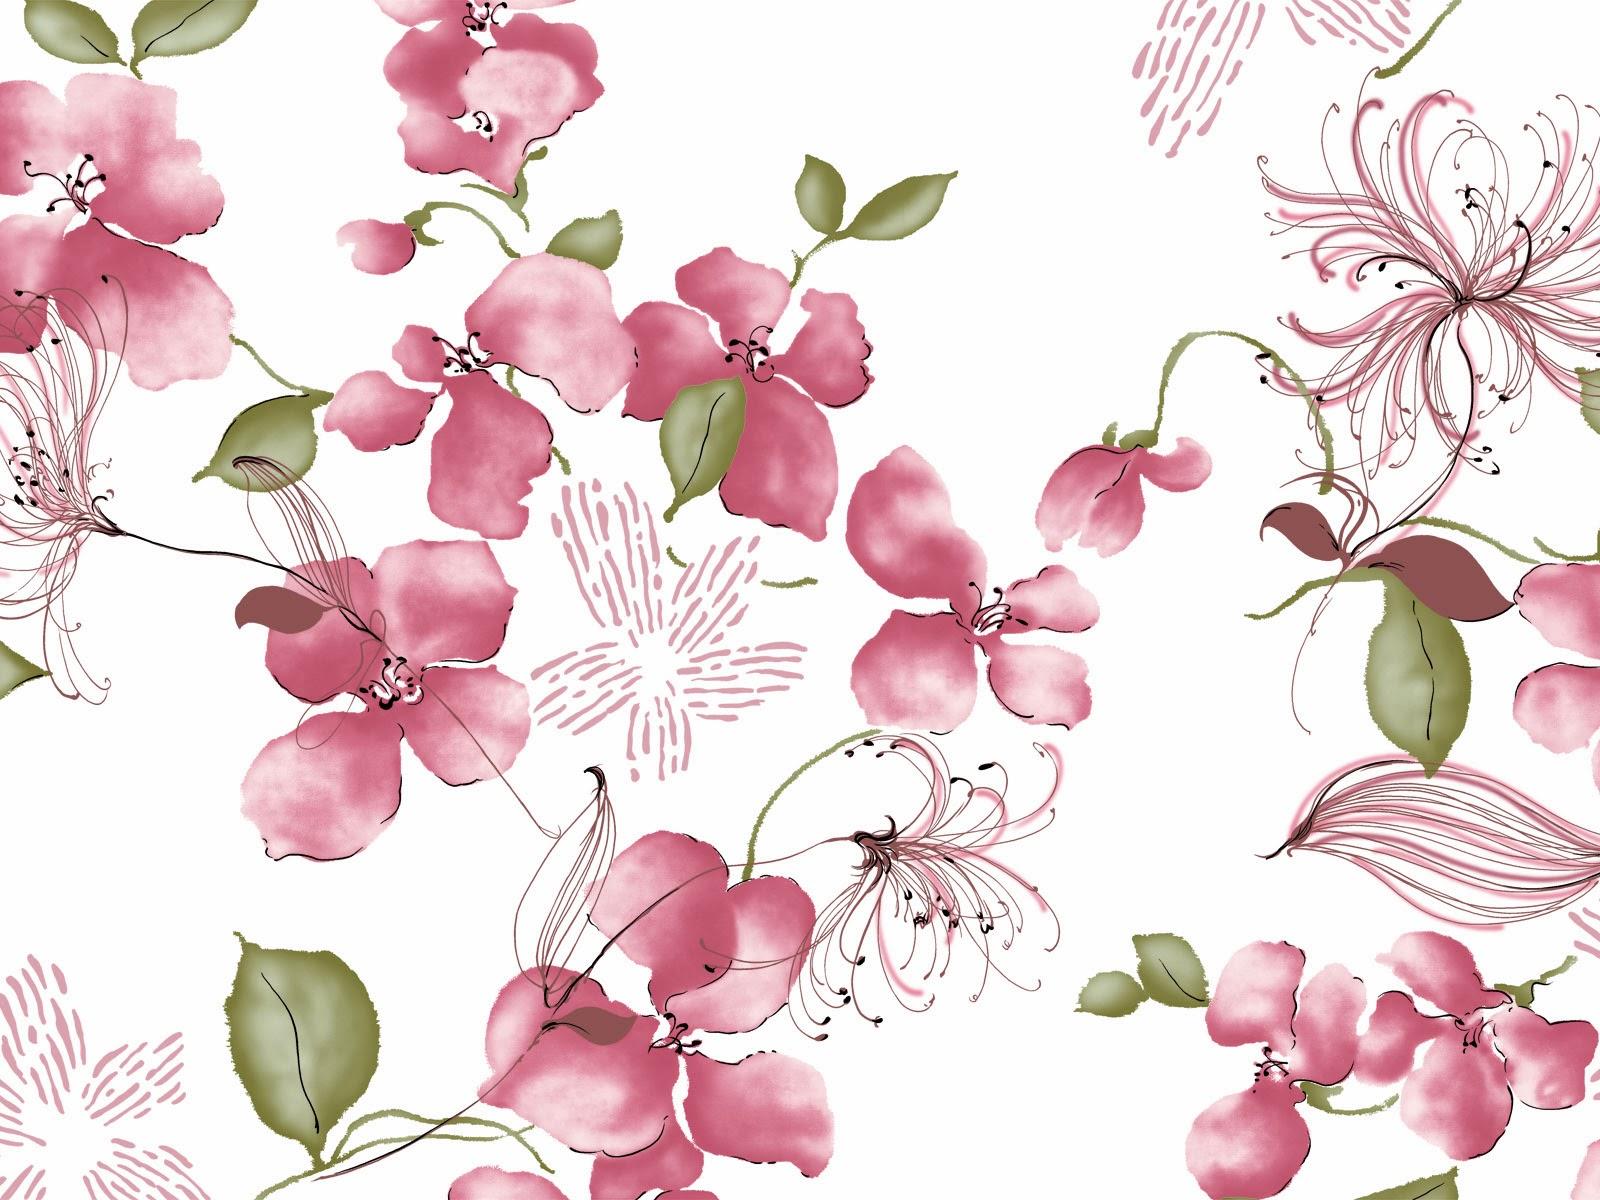 Vintage flower wallpaper and make this Vintage flower wallpaper for 1600x1200